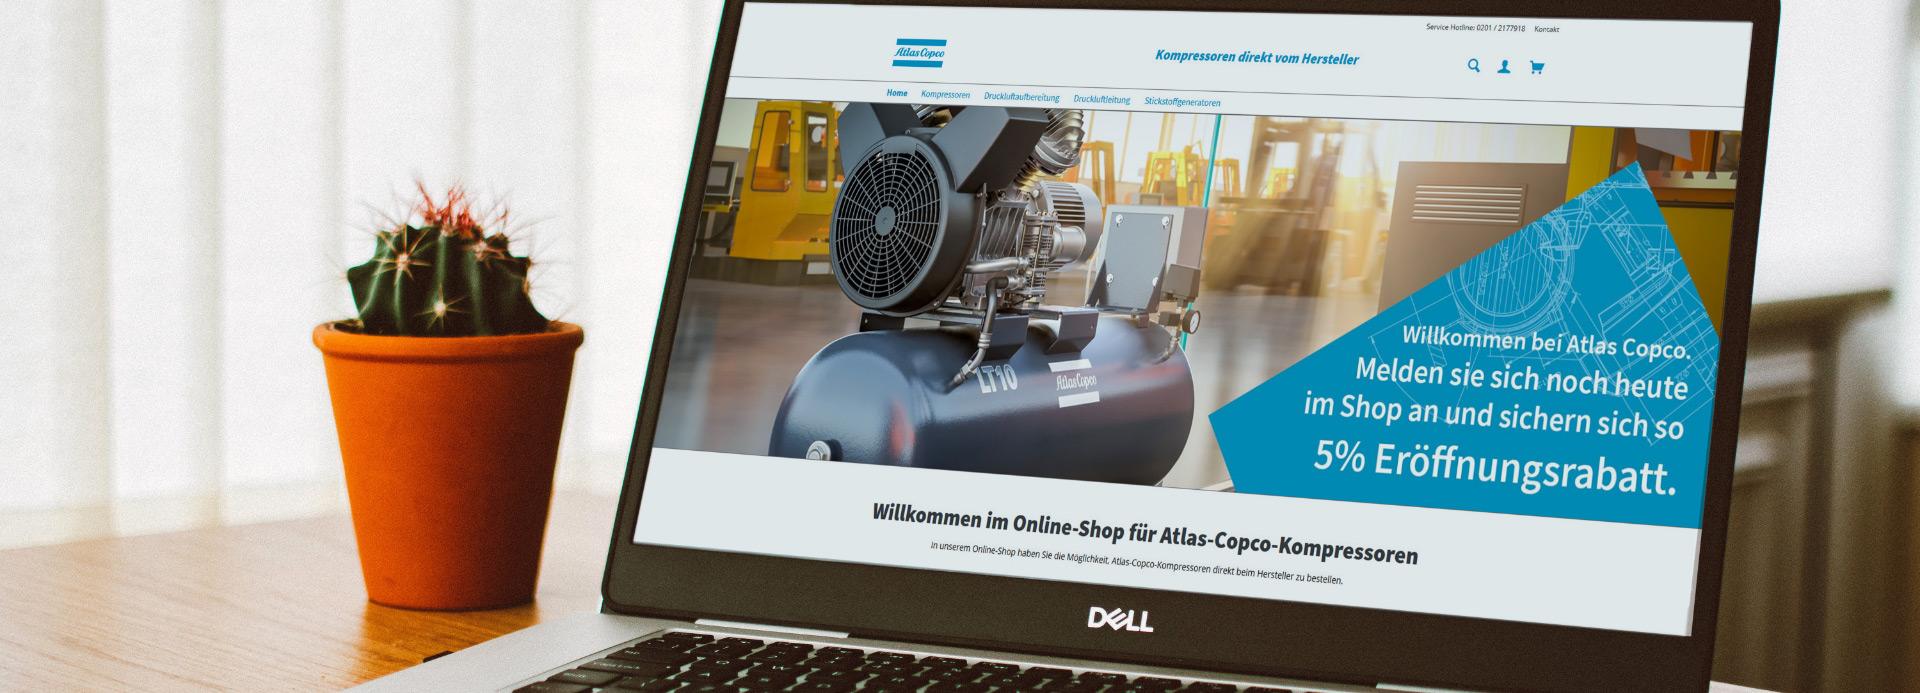 Grafik Shopware Onlineshop Erstellung